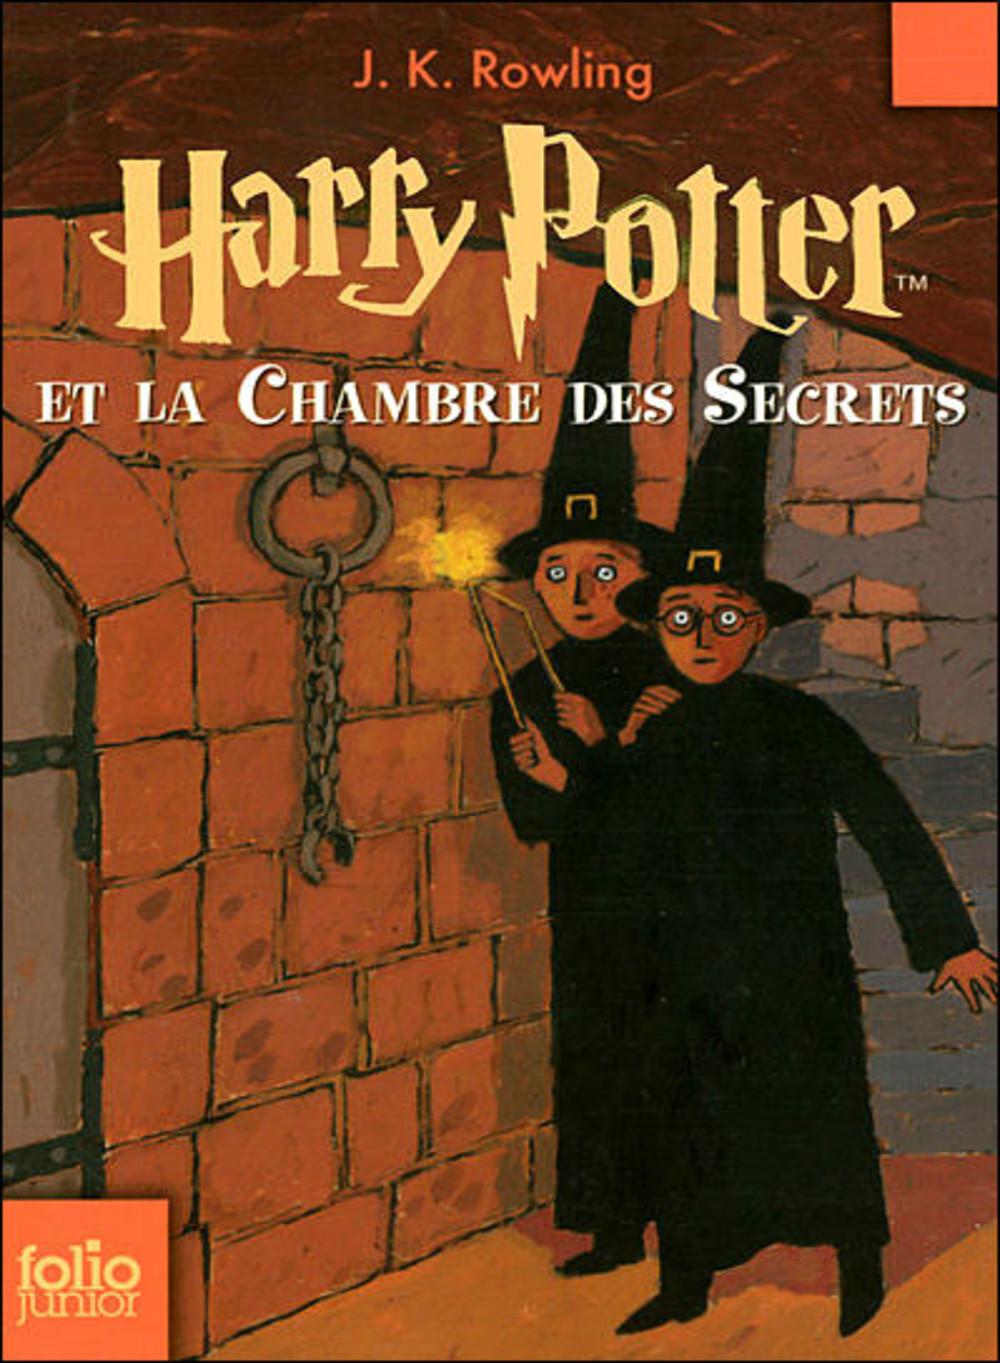 Harry Potter and the Chamber of Secrets Harry Potter et la